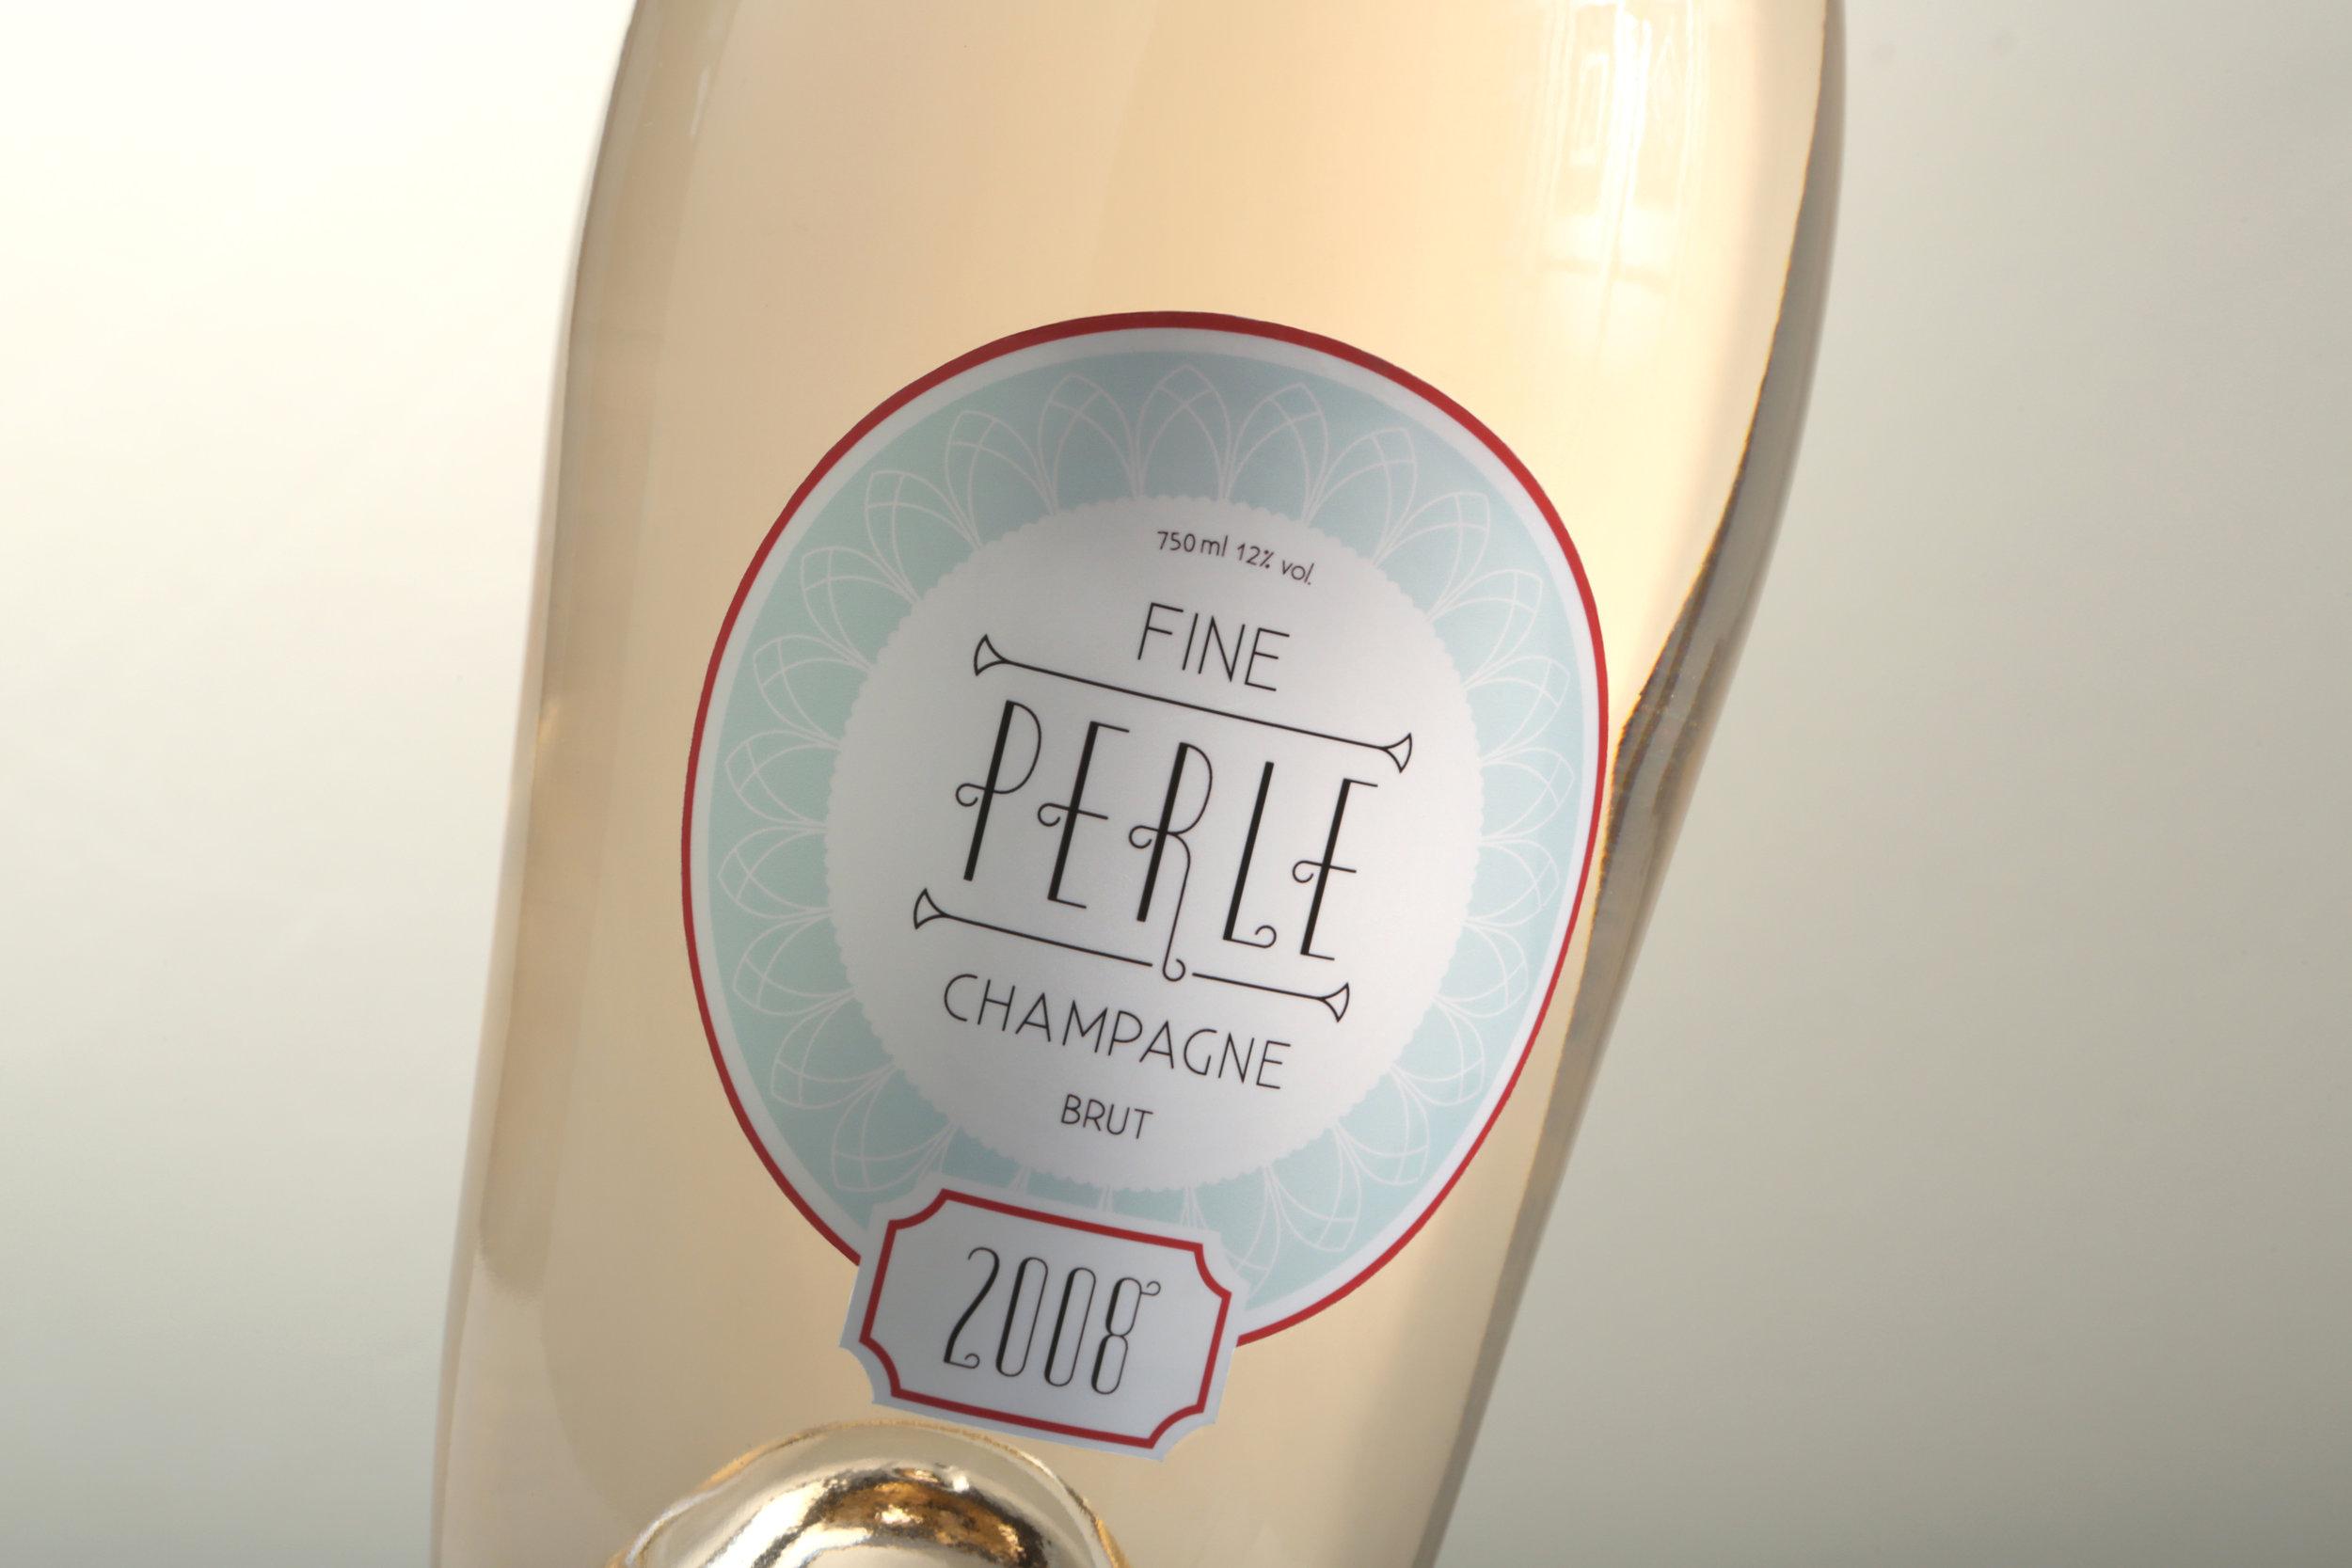 perle_champagne label.jpg